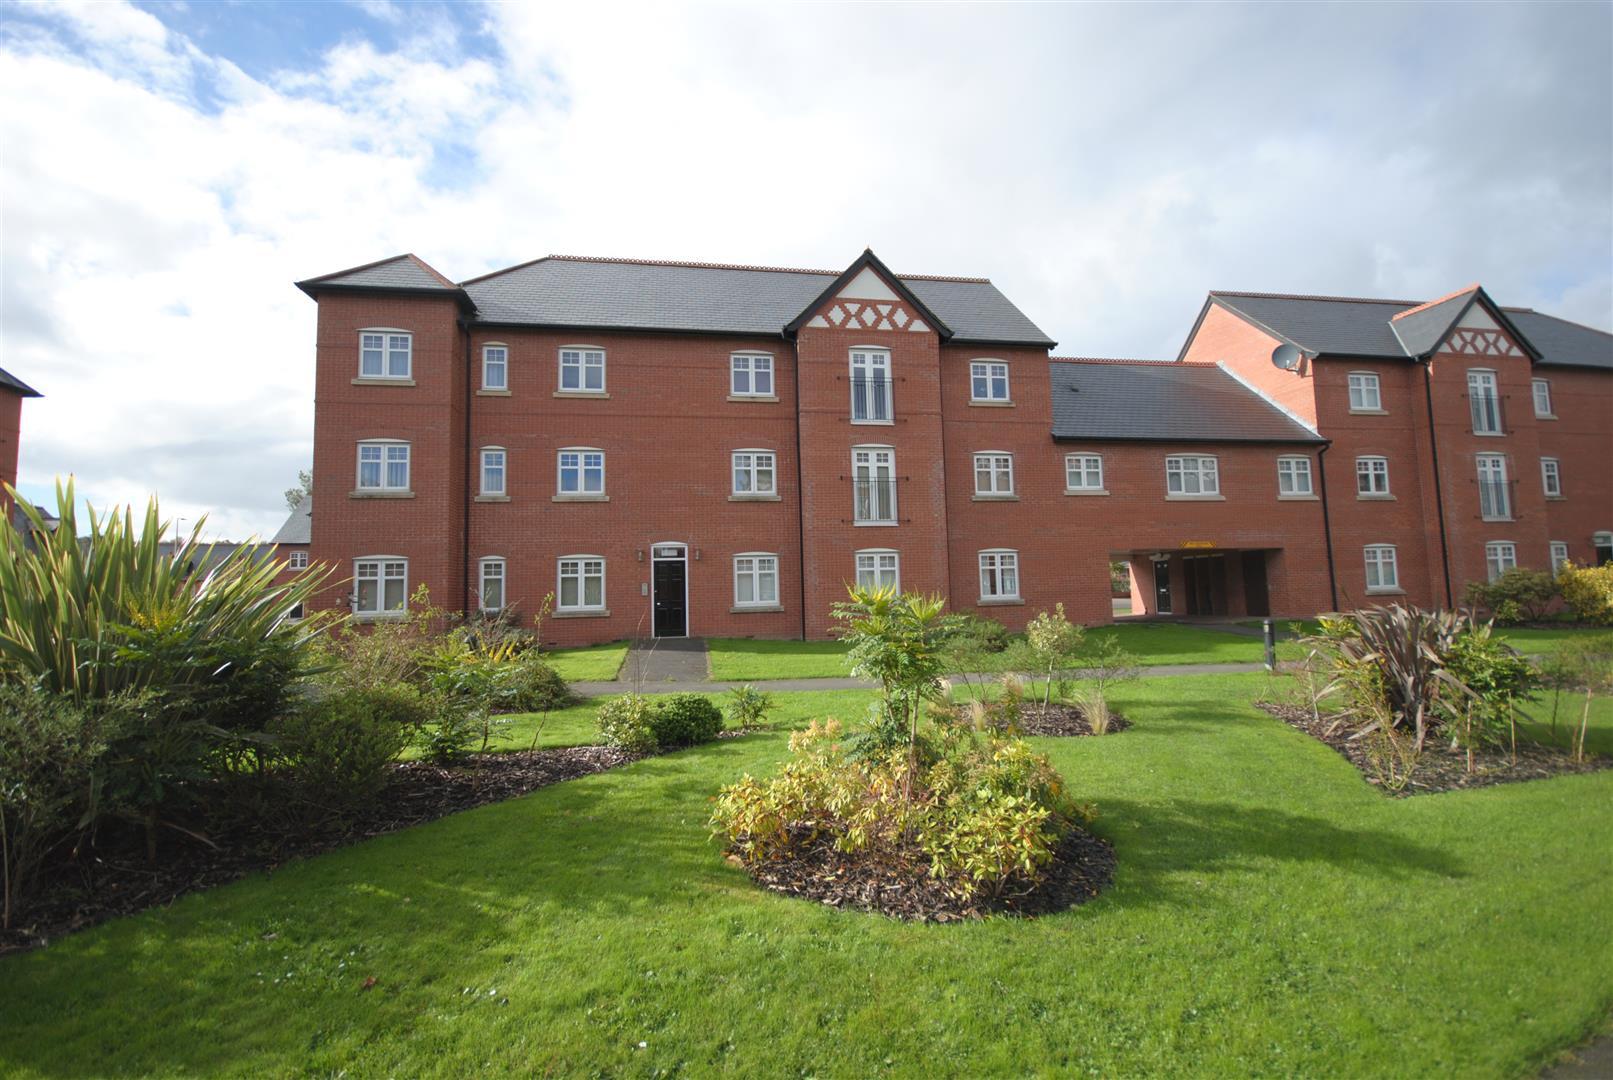 2 Bedrooms Flat for sale in Alden Close, Standish, Wigan